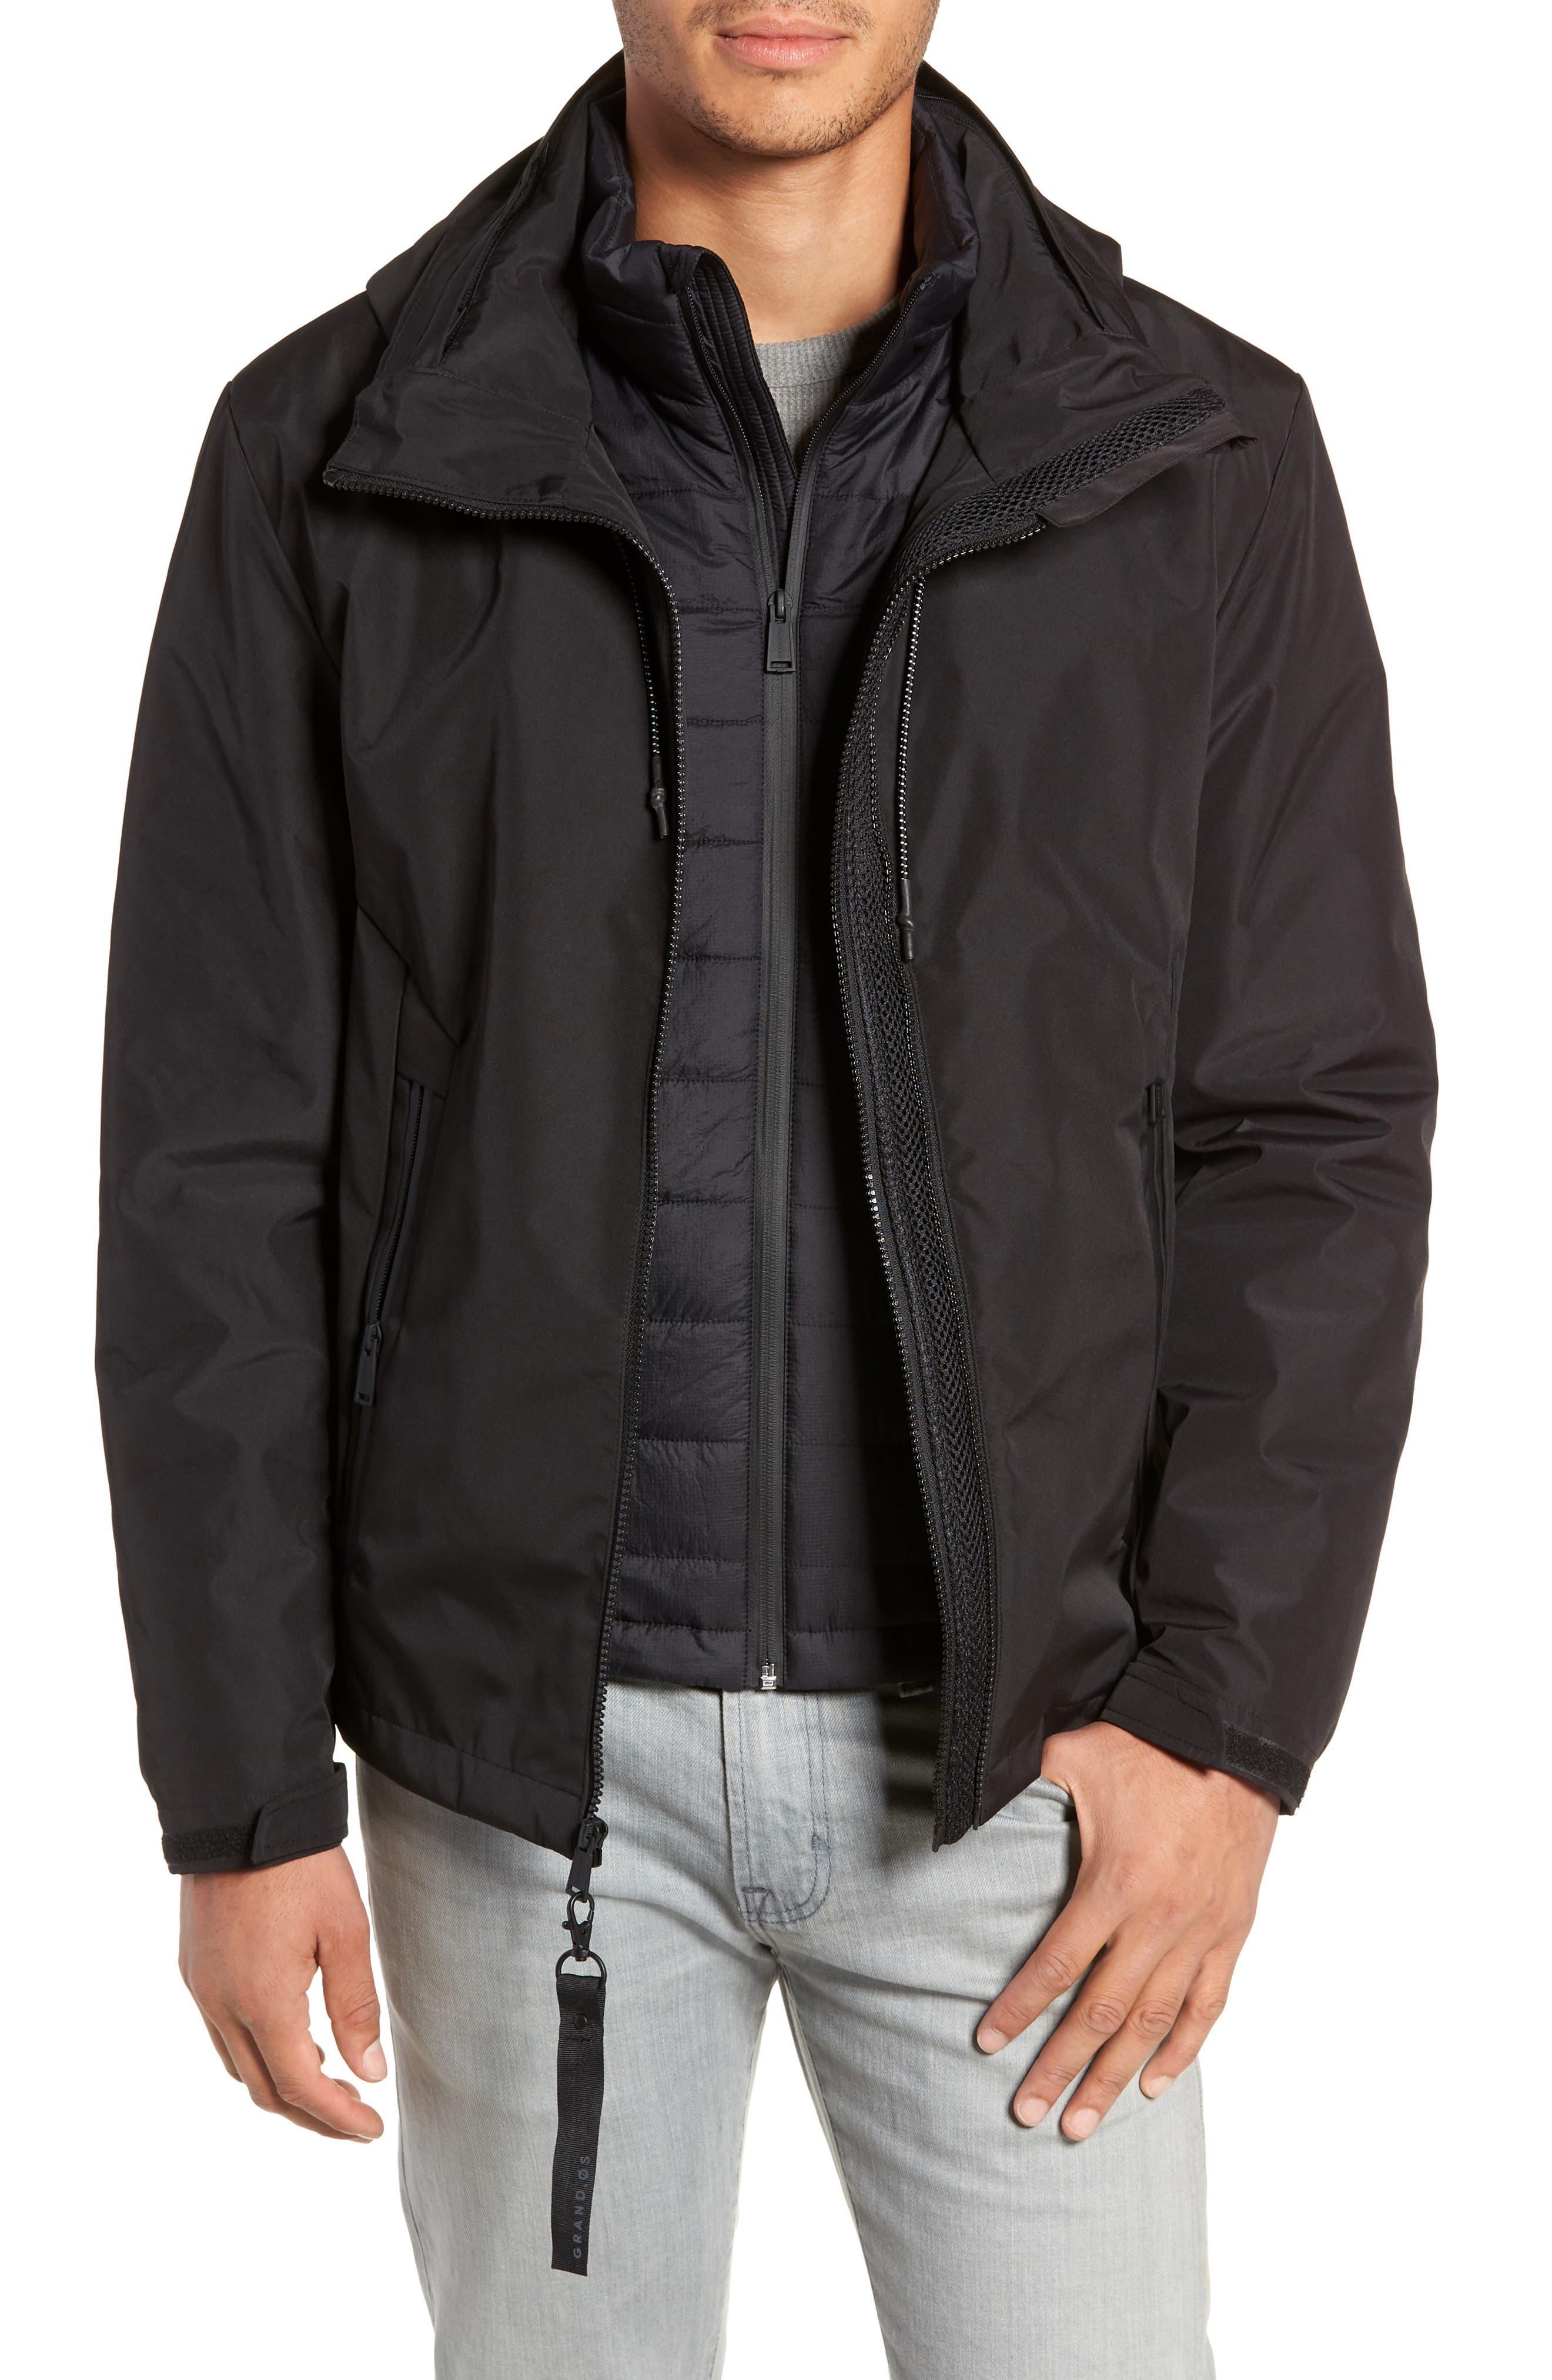 3-in-1 Rain Jacket,                         Main,                         color, BLACK